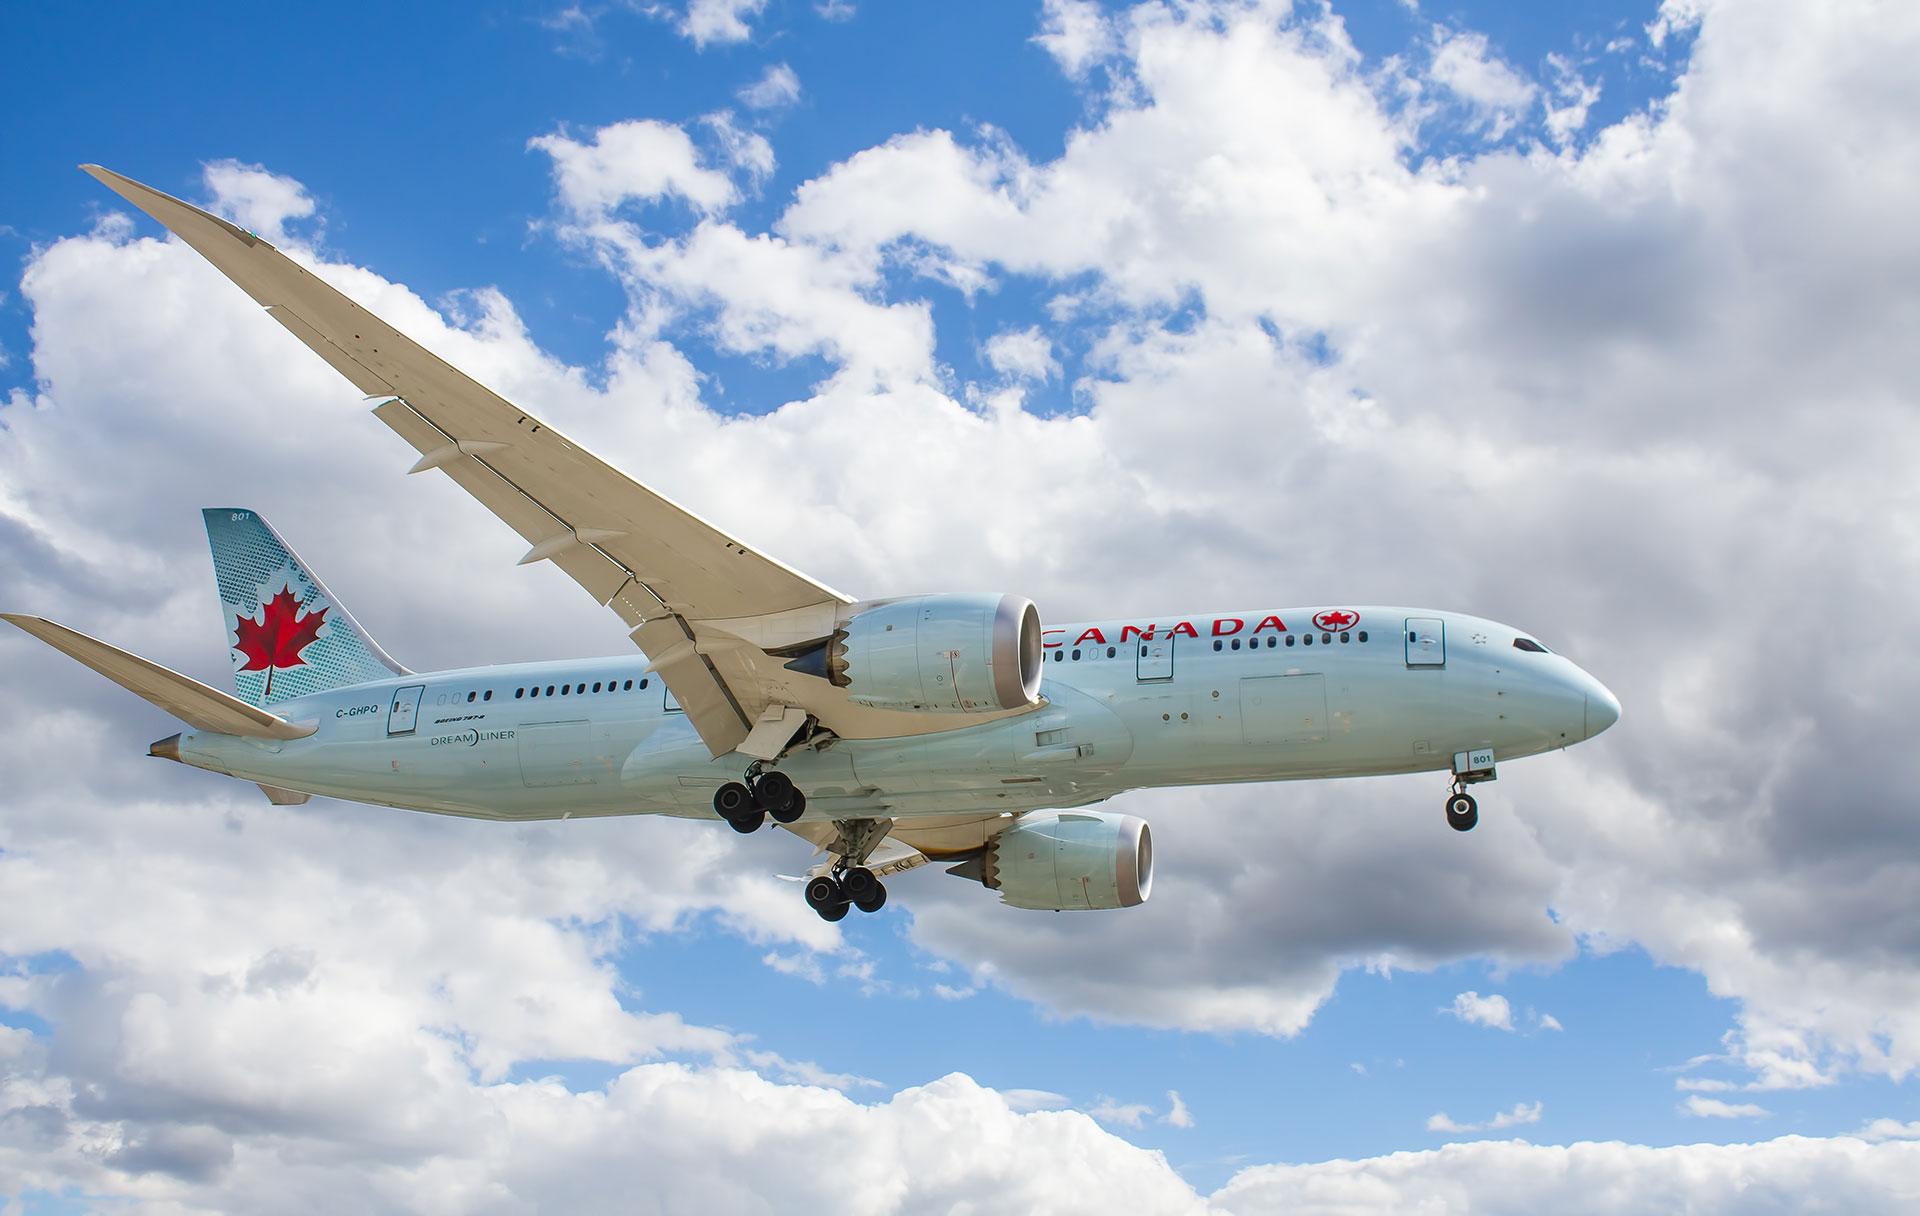 Air Canada Flight tracker